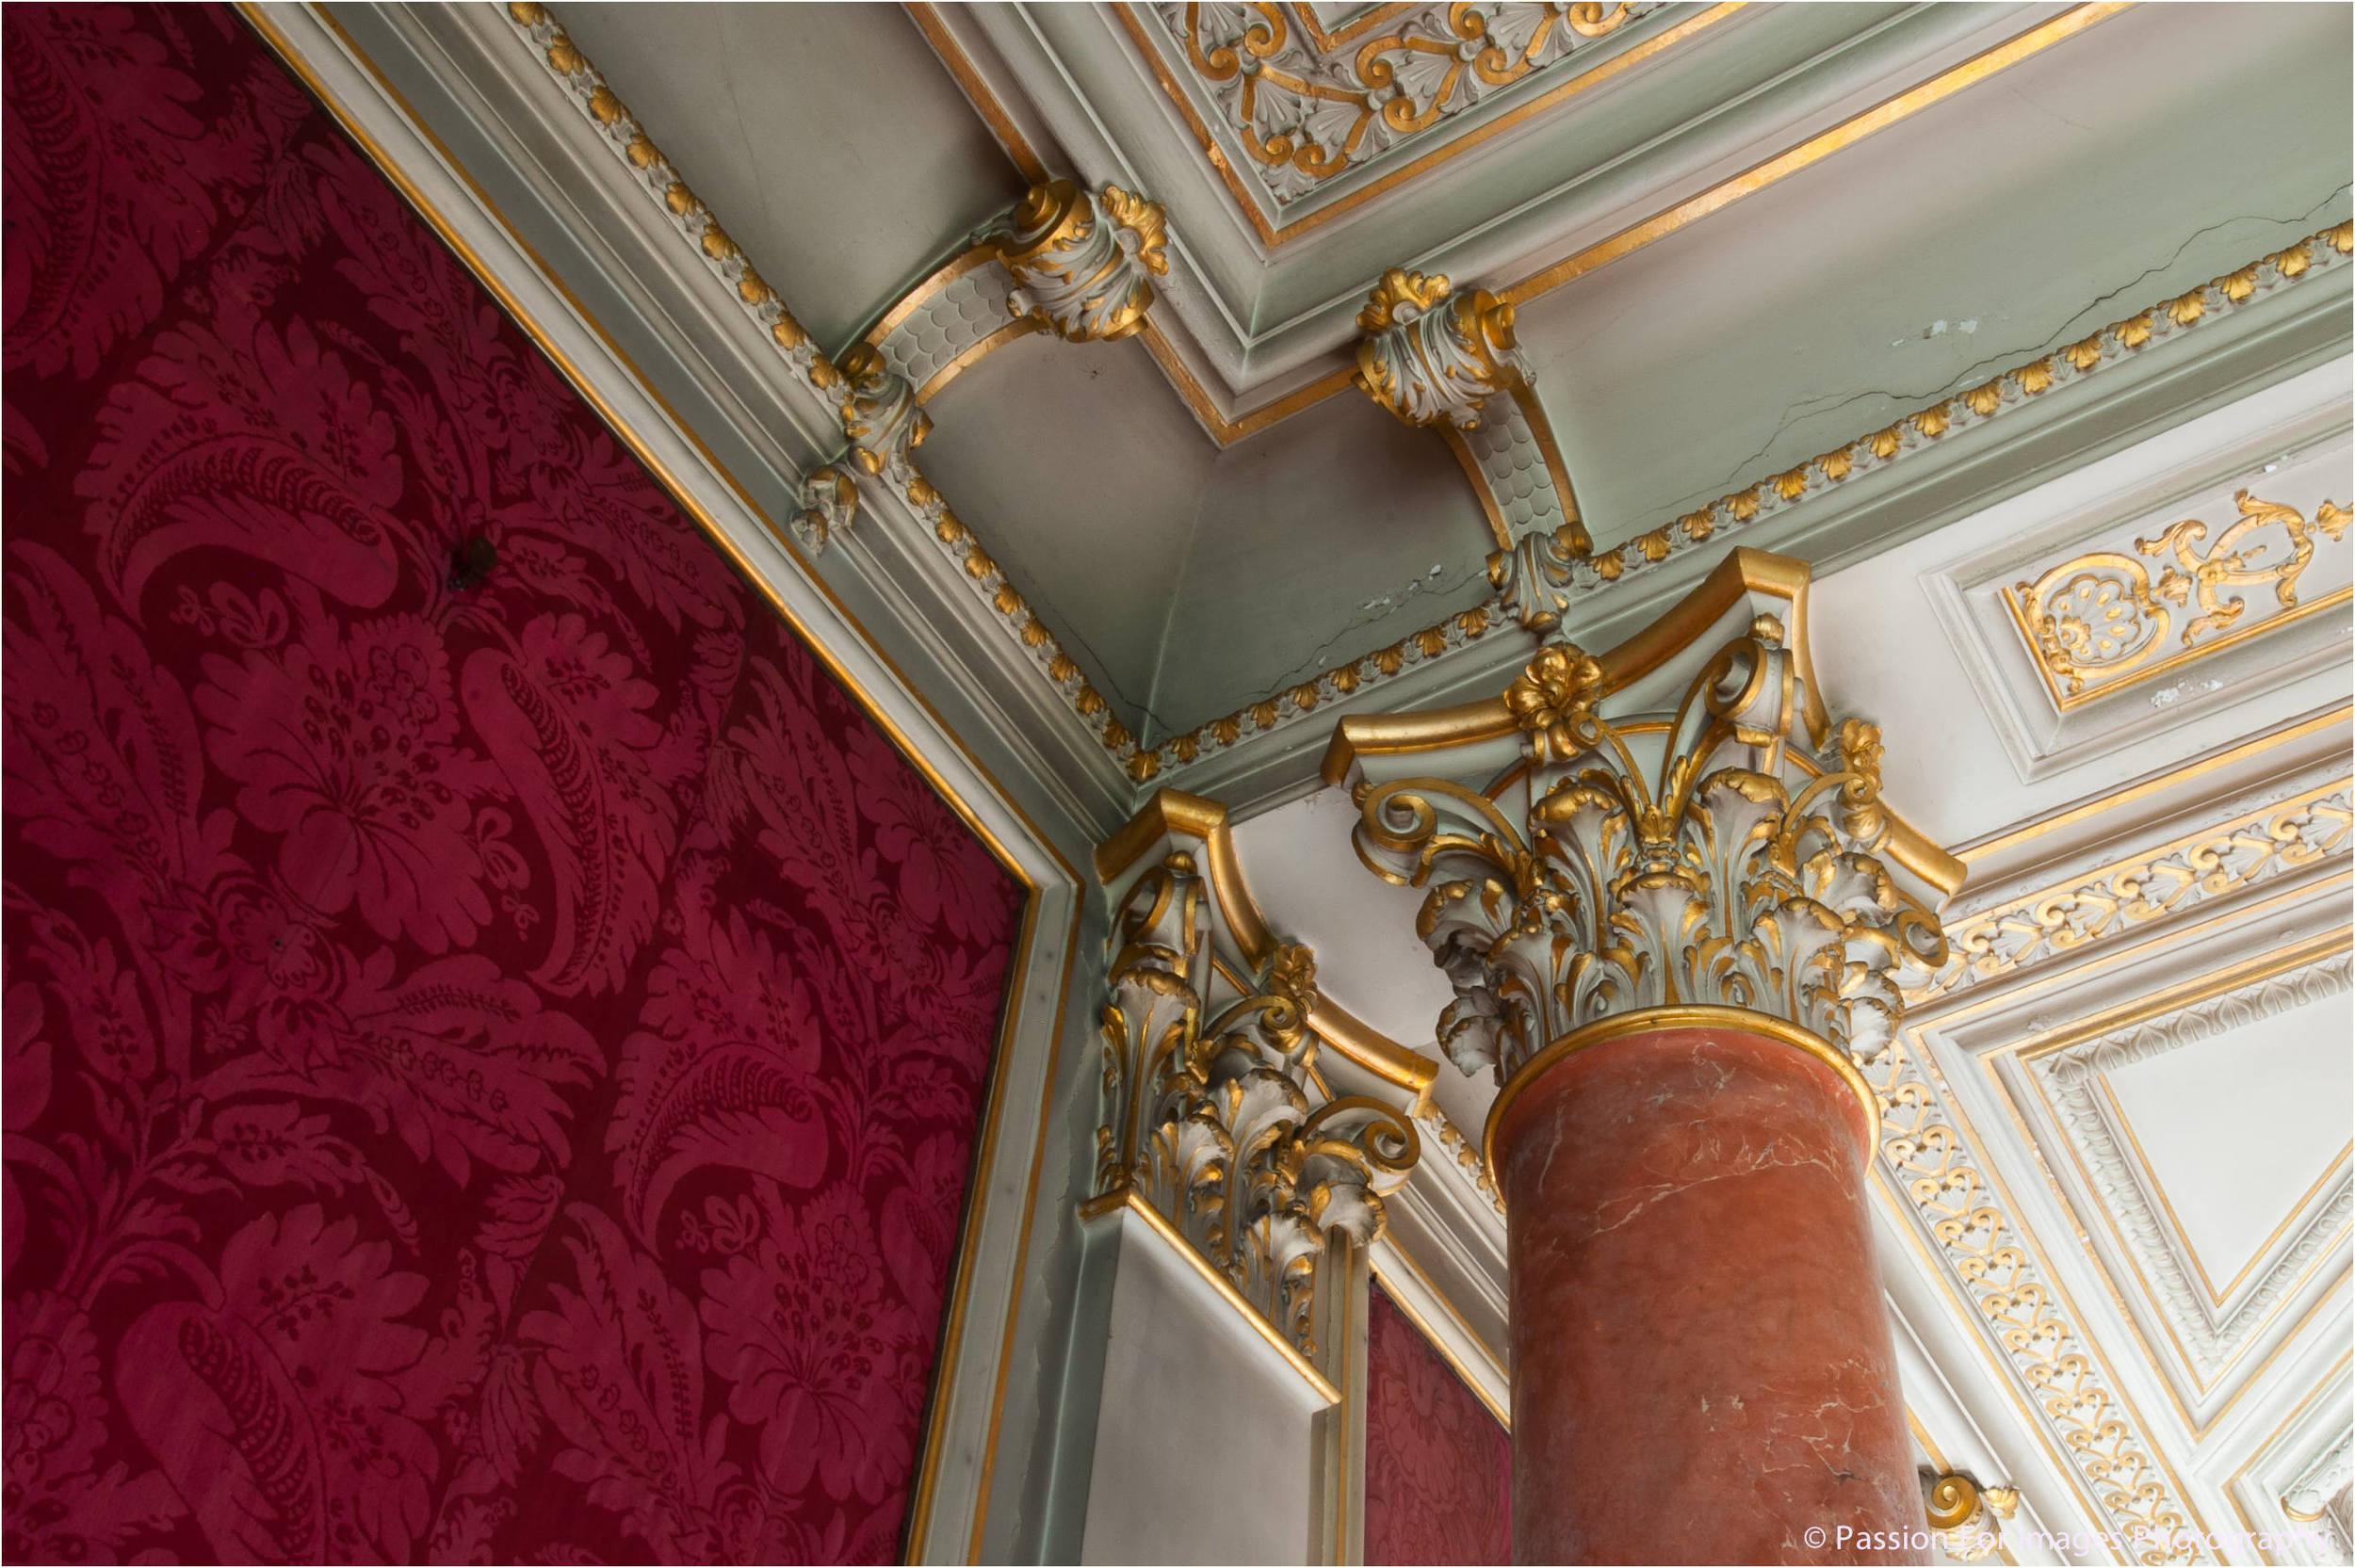 PFI__D7C0681_2014_08_Chateau_Lumiere.jpg